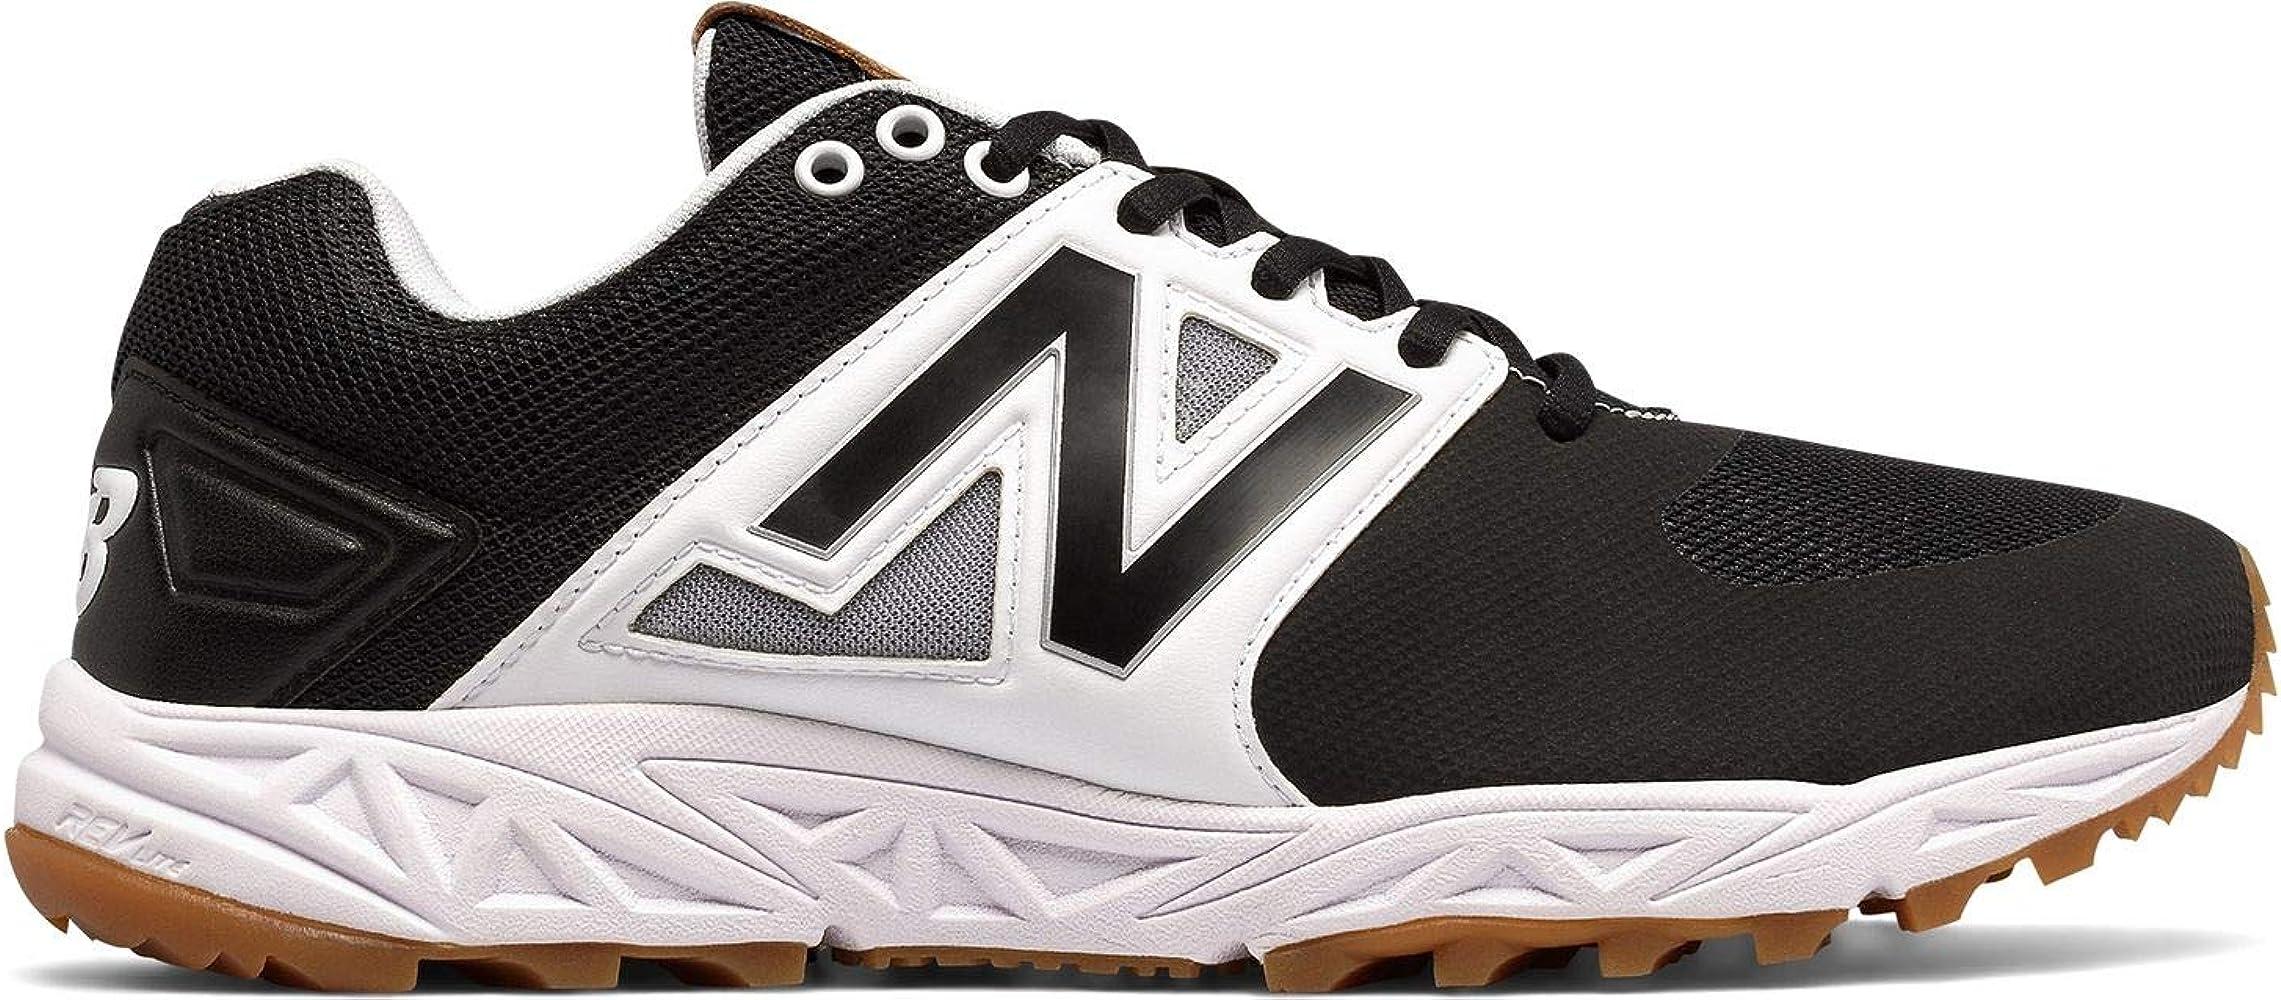 New Balance Mens T3000v3 Turf Shoes